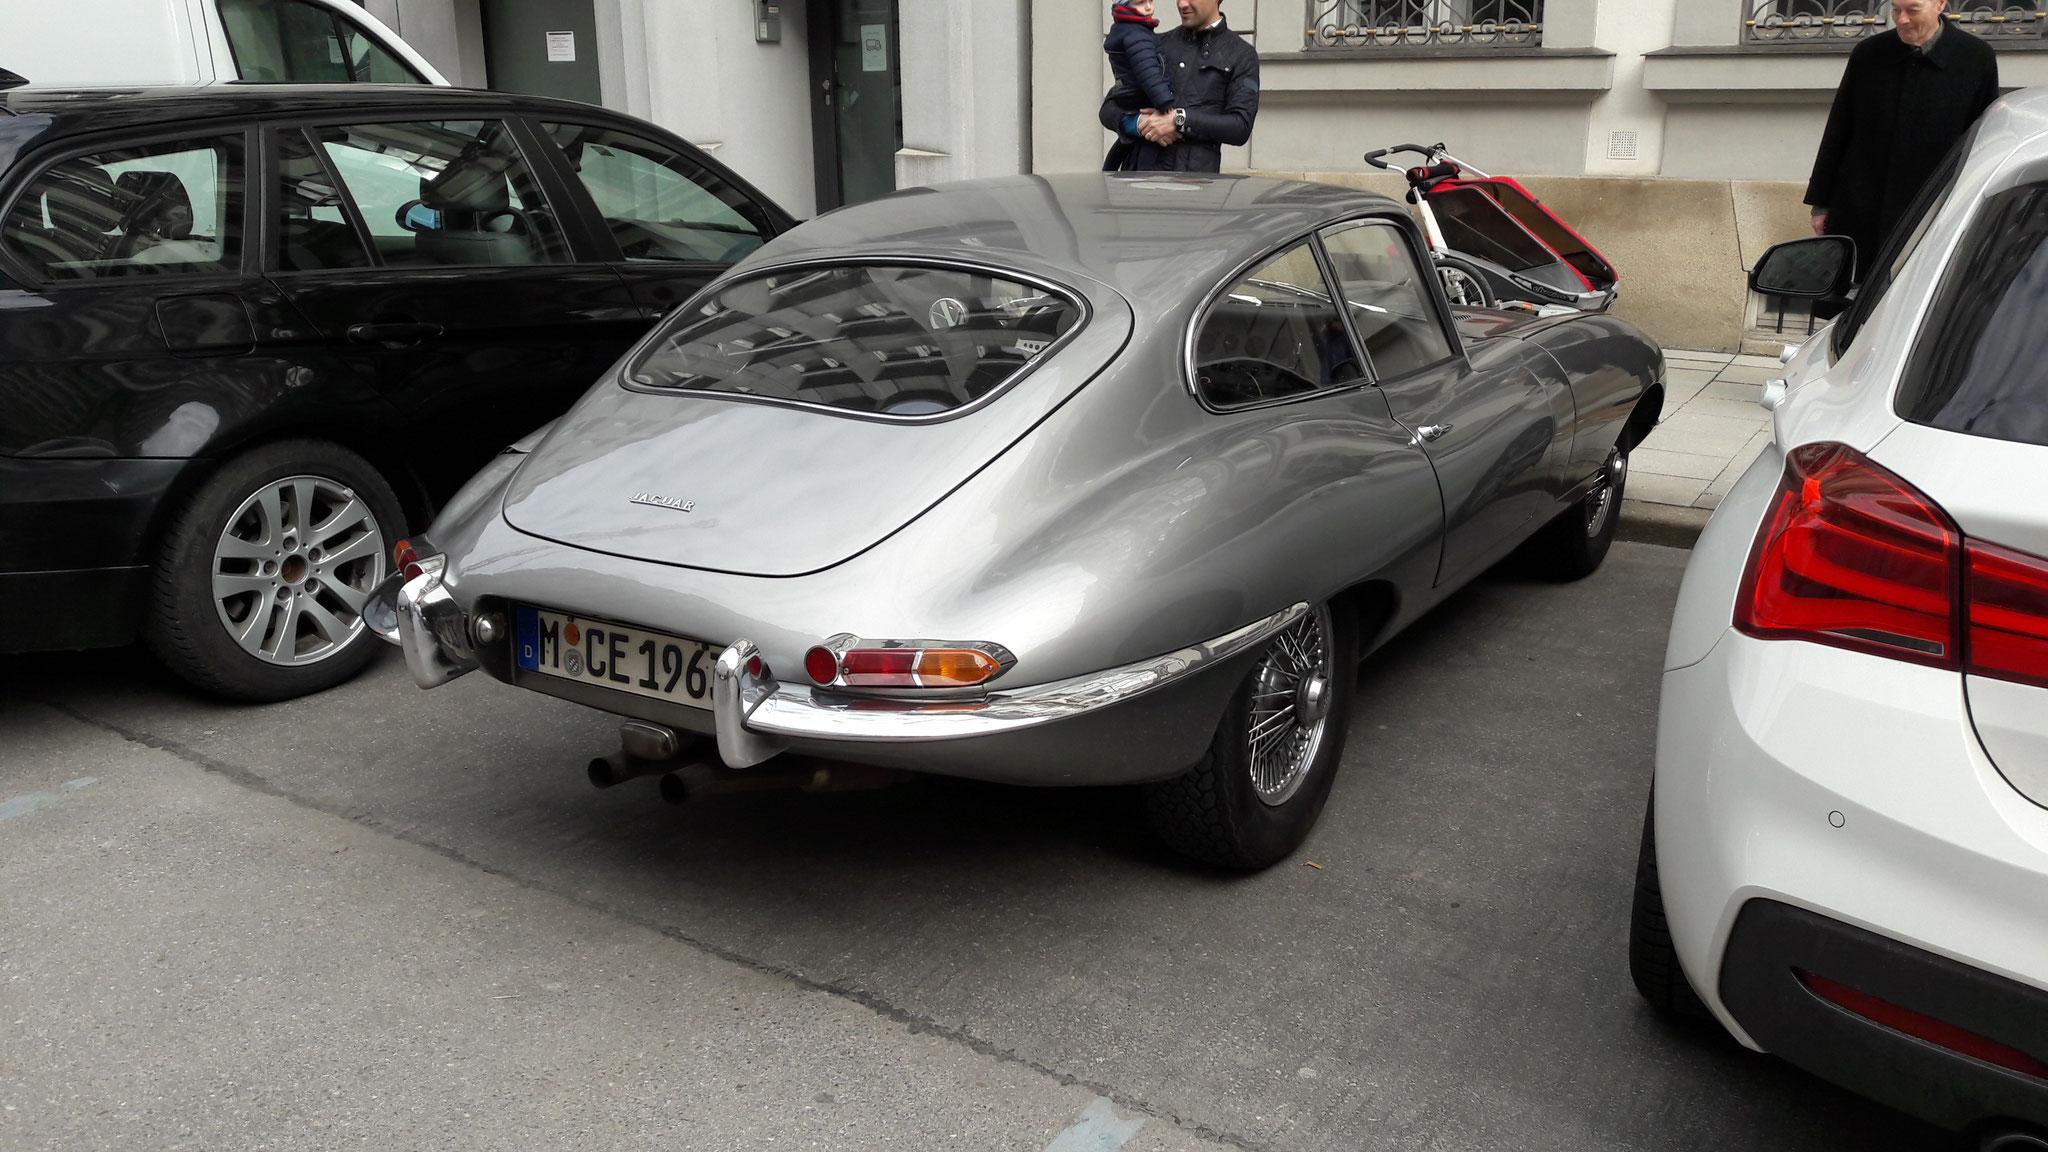 Jaugar E-Type - M-CE-1963H